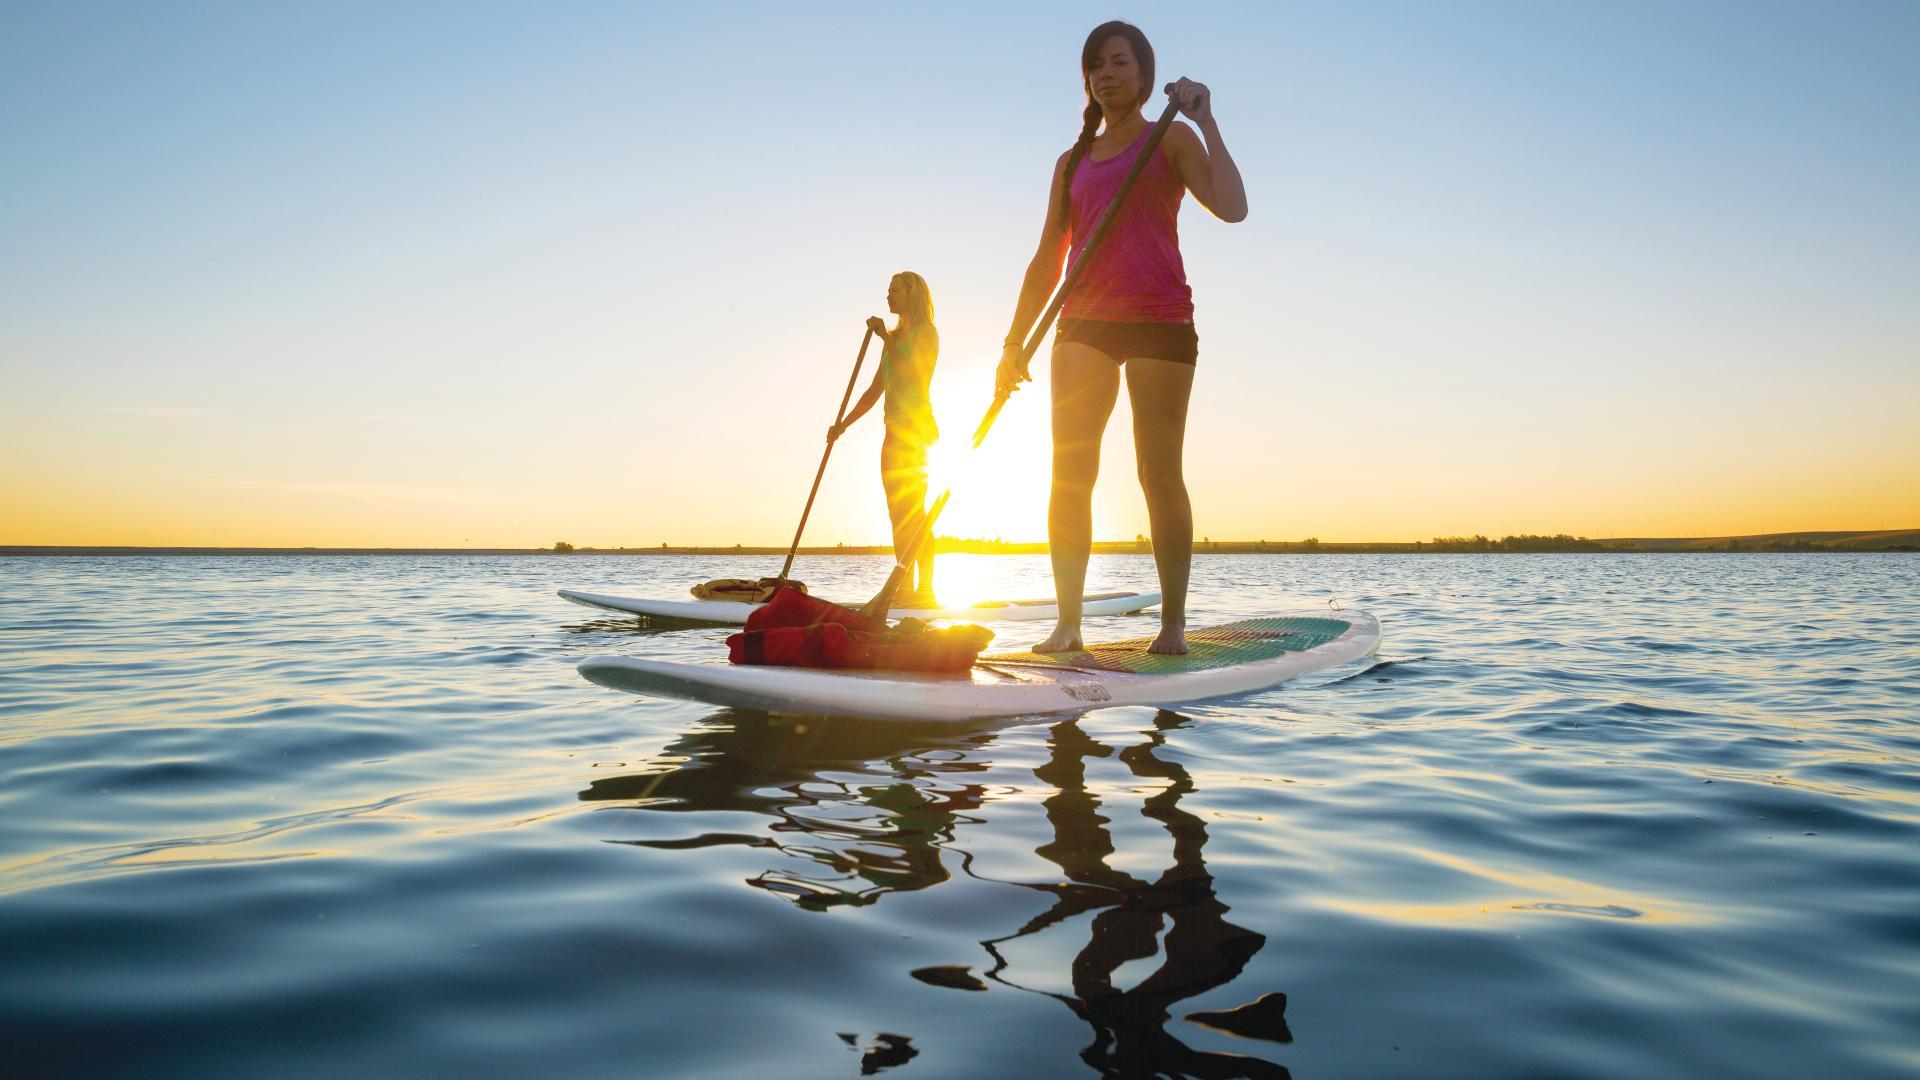 Enjoy non-motorized boating on the Aurora Reservoir